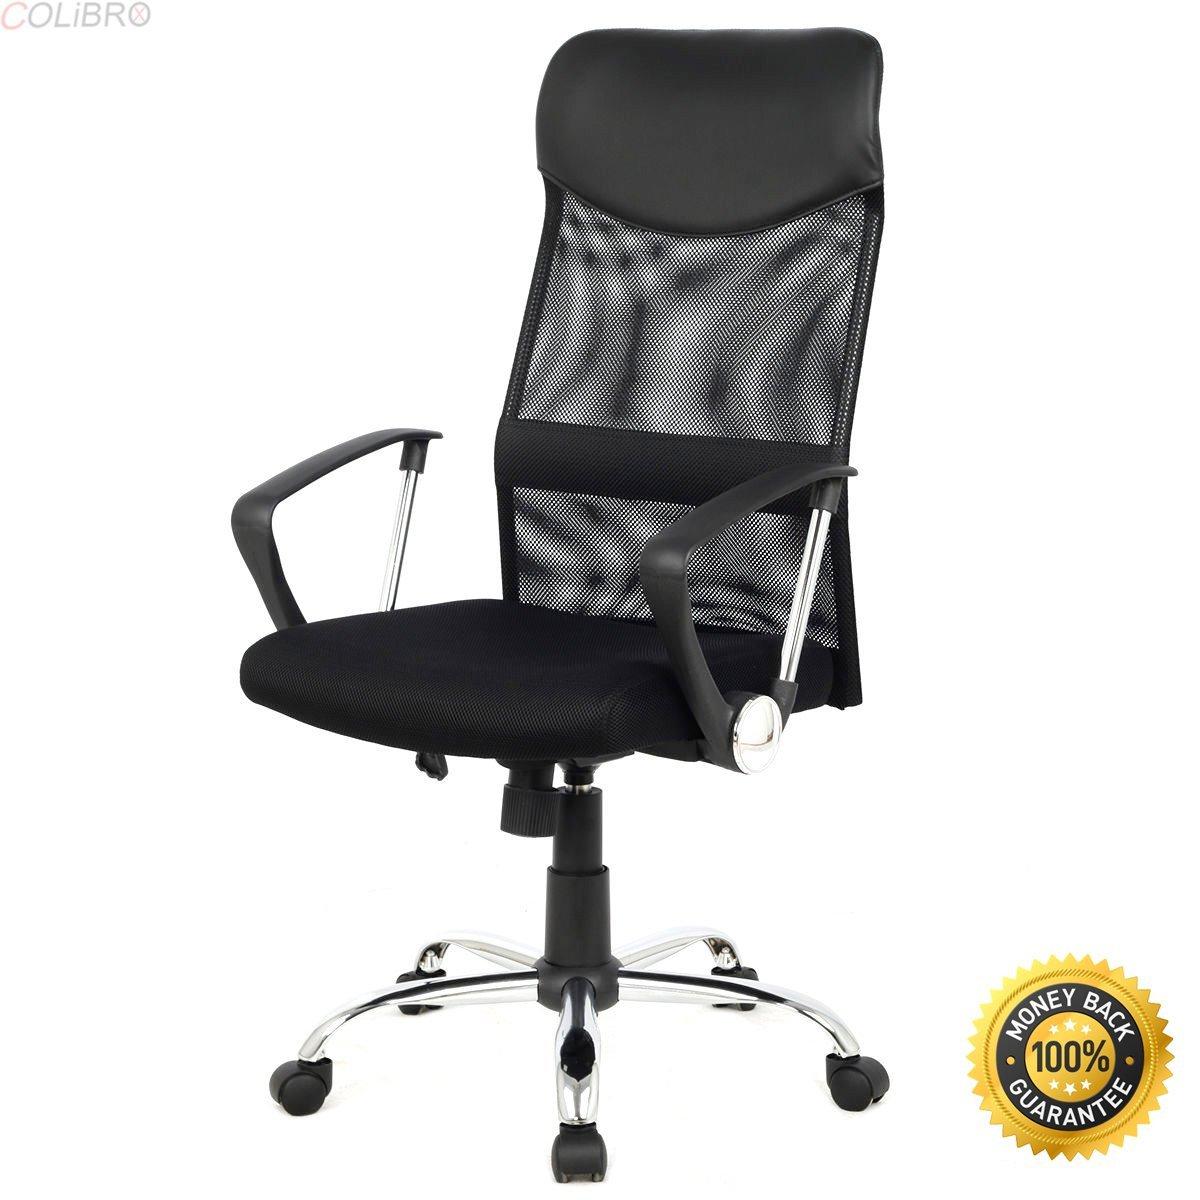 COLIBROX--Modern Ergonomic Mesh High Back Executive Computer Desk Task Office Chair Black